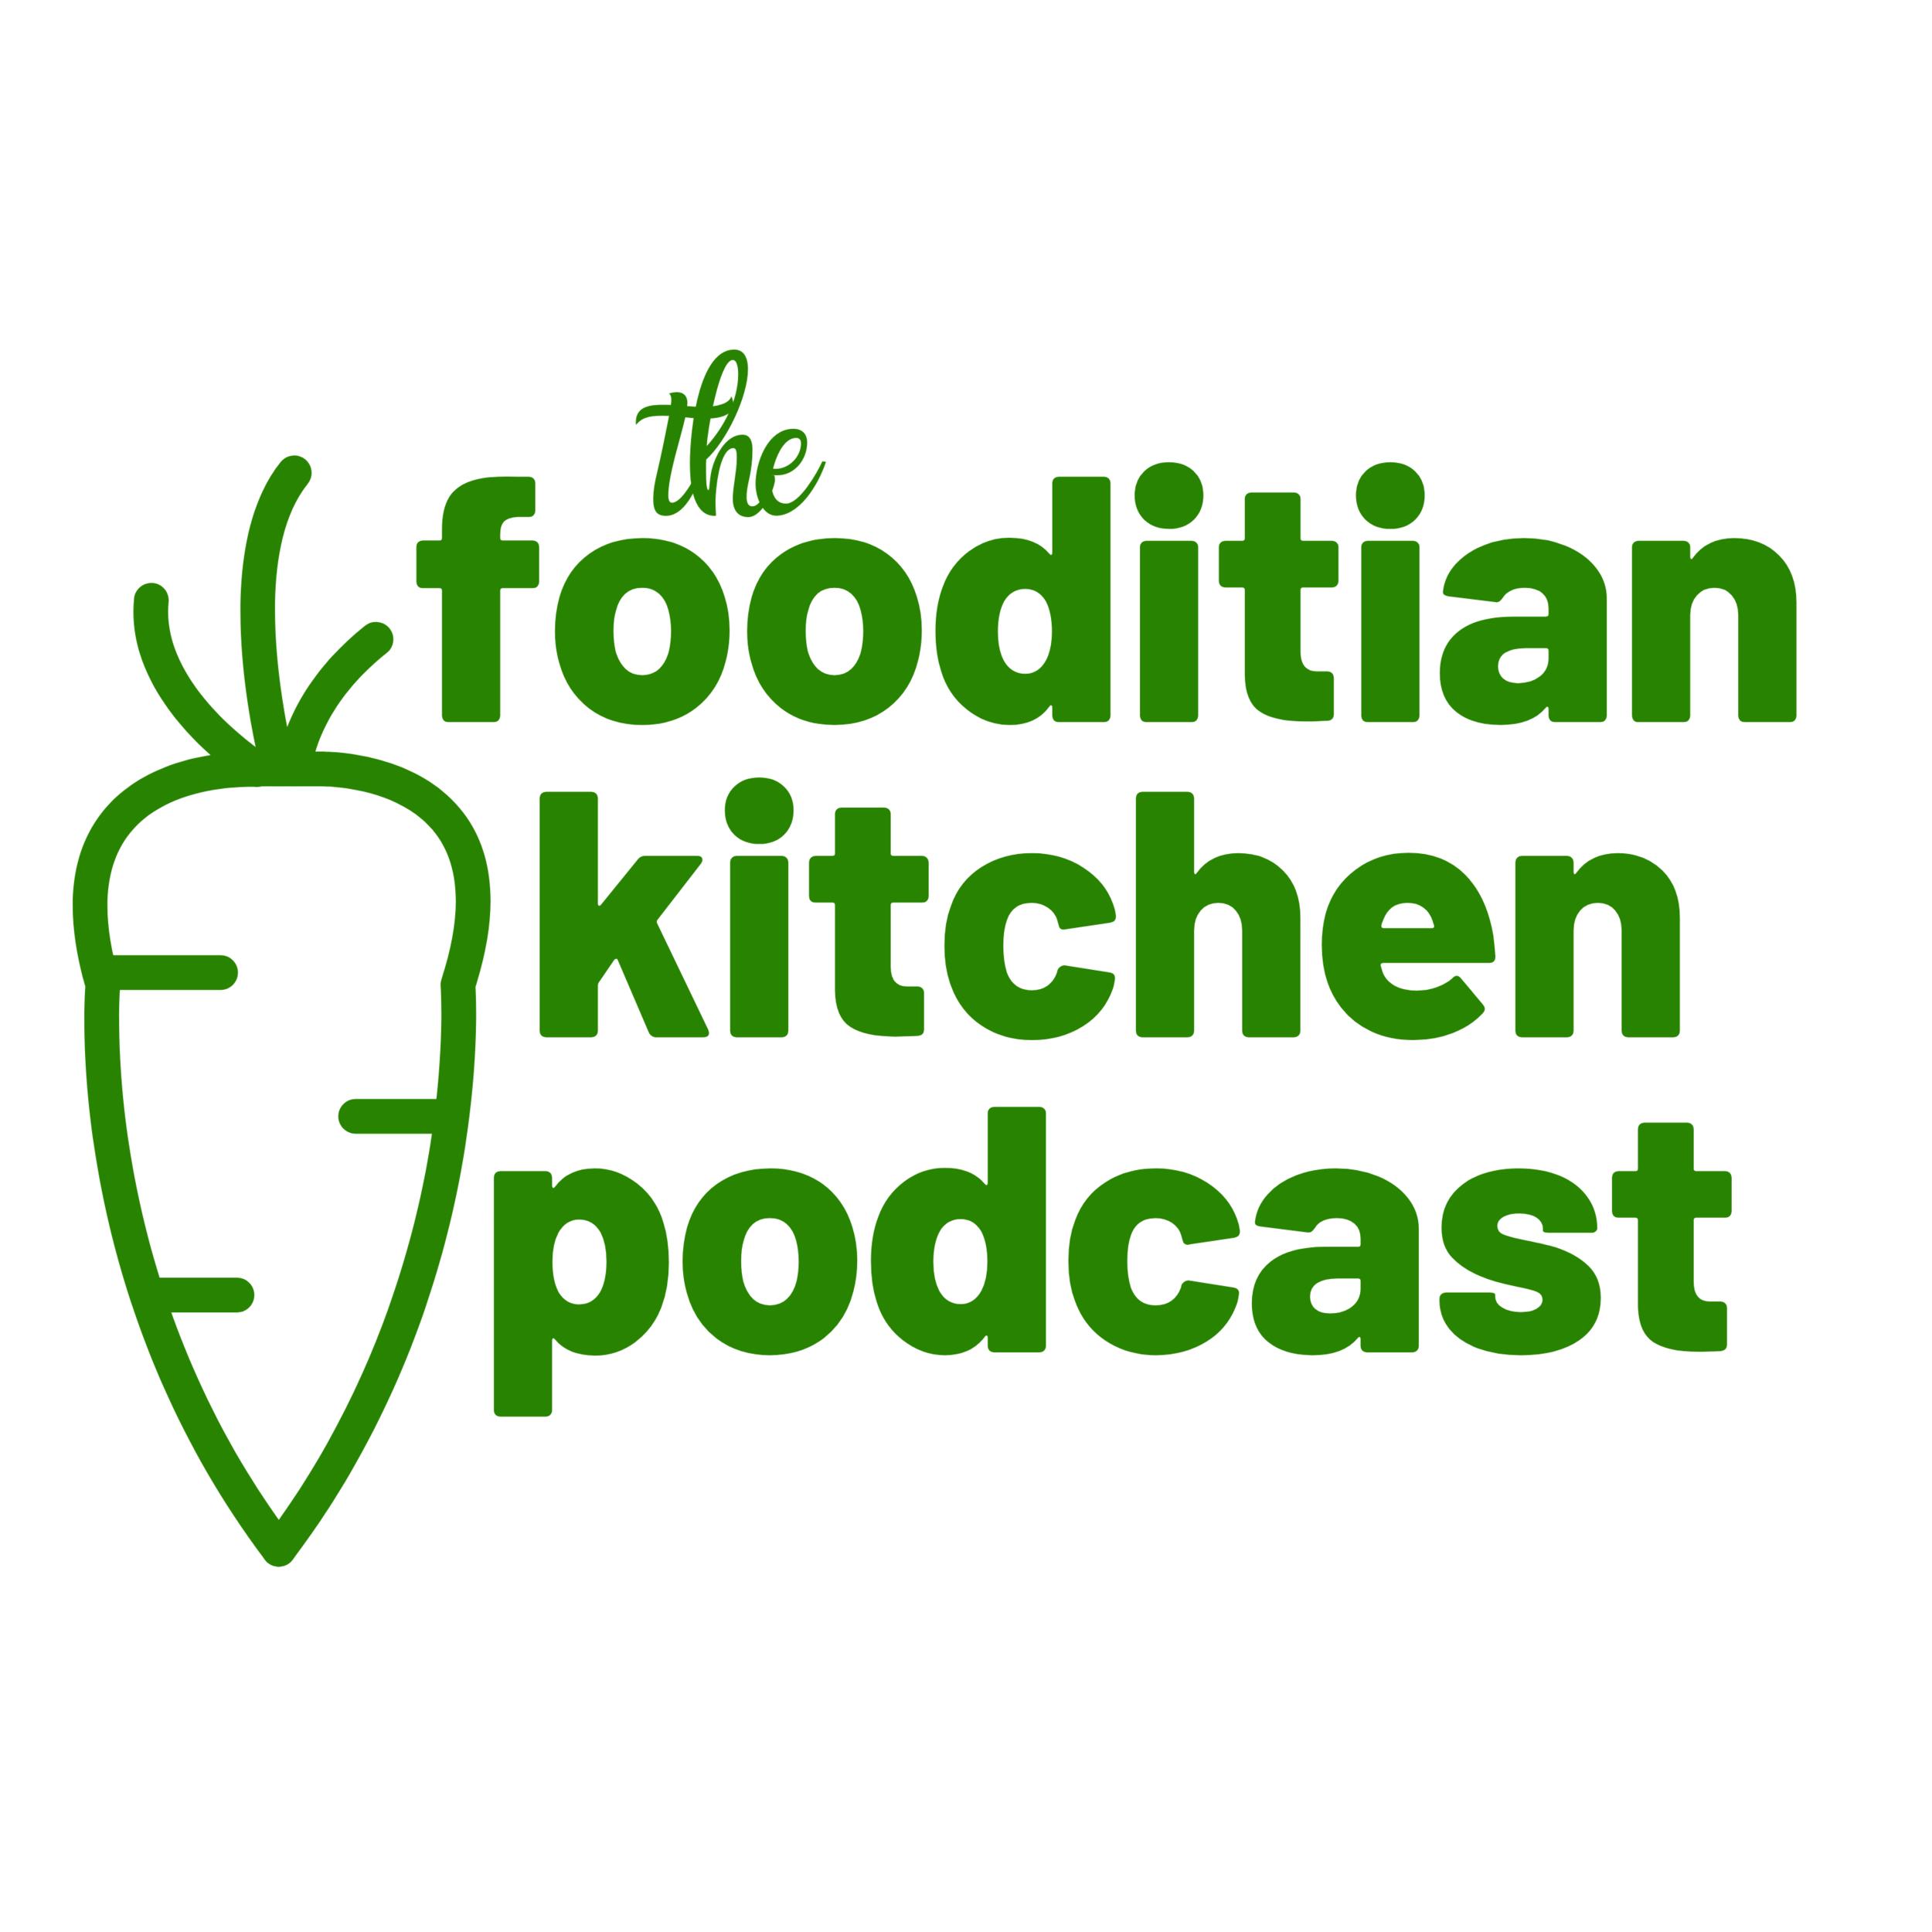 fooditian kitchen